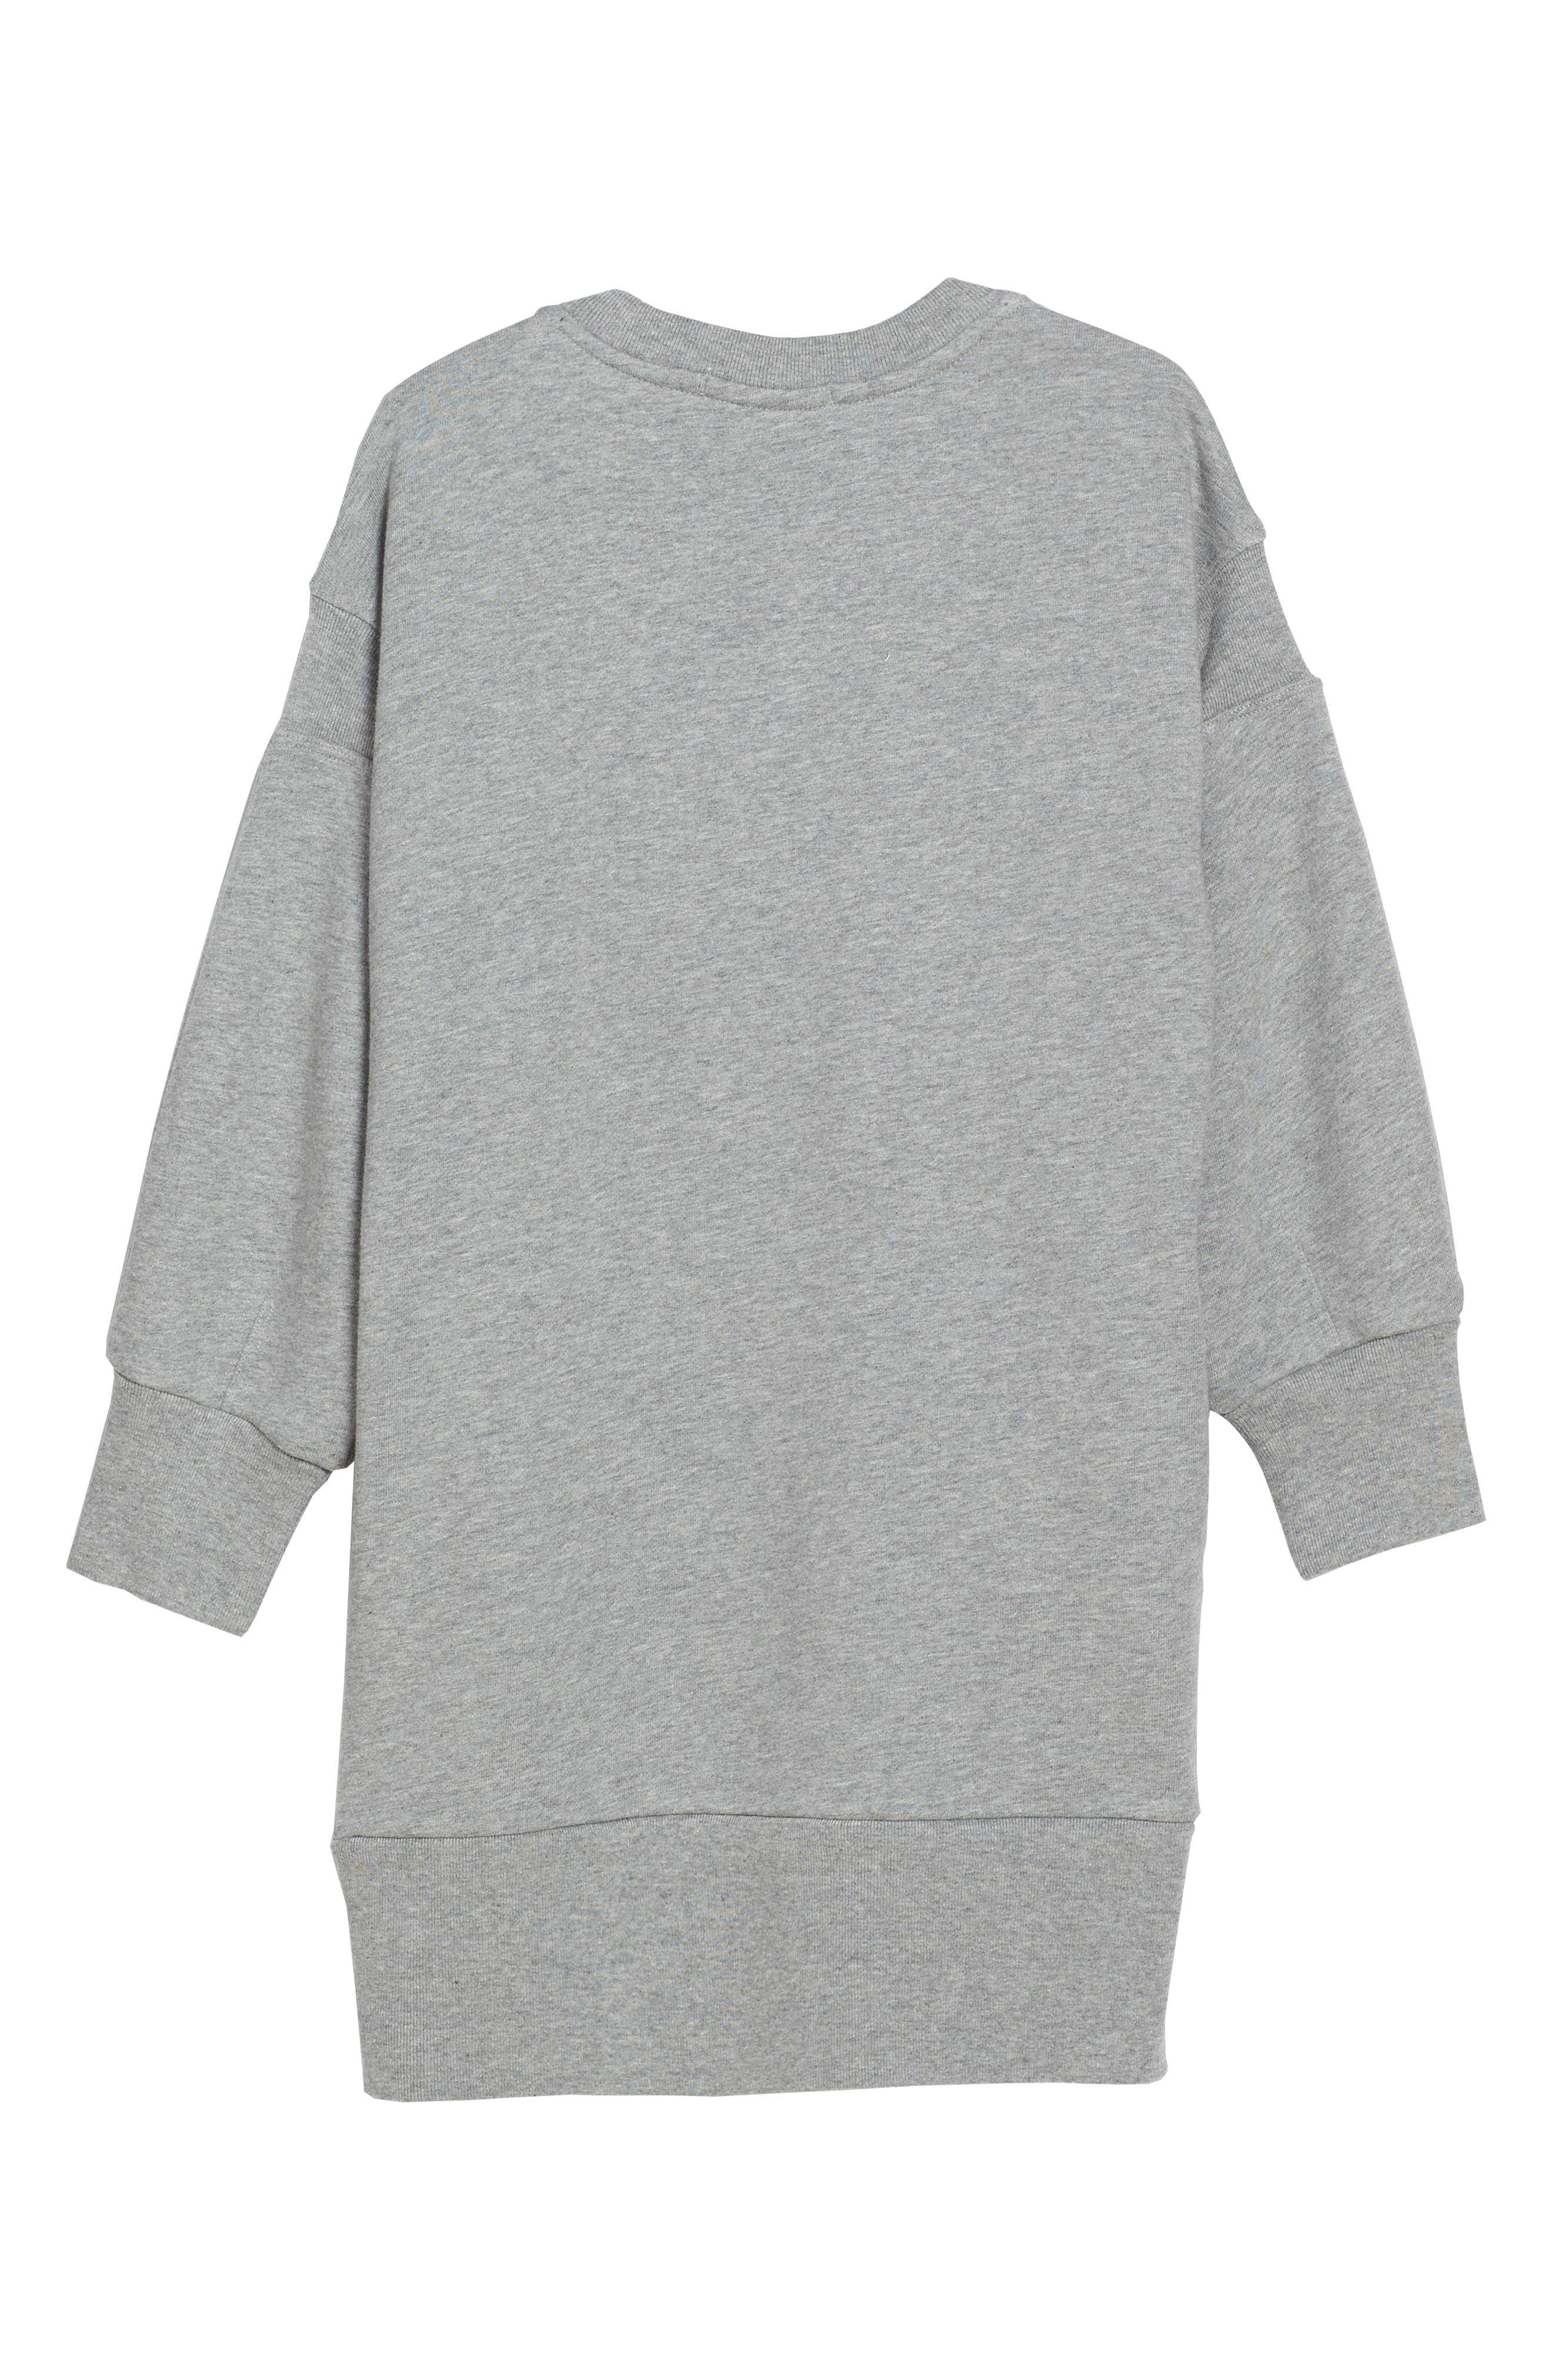 Sweatshirt Dress,                             Alternate thumbnail 2, color,                             035